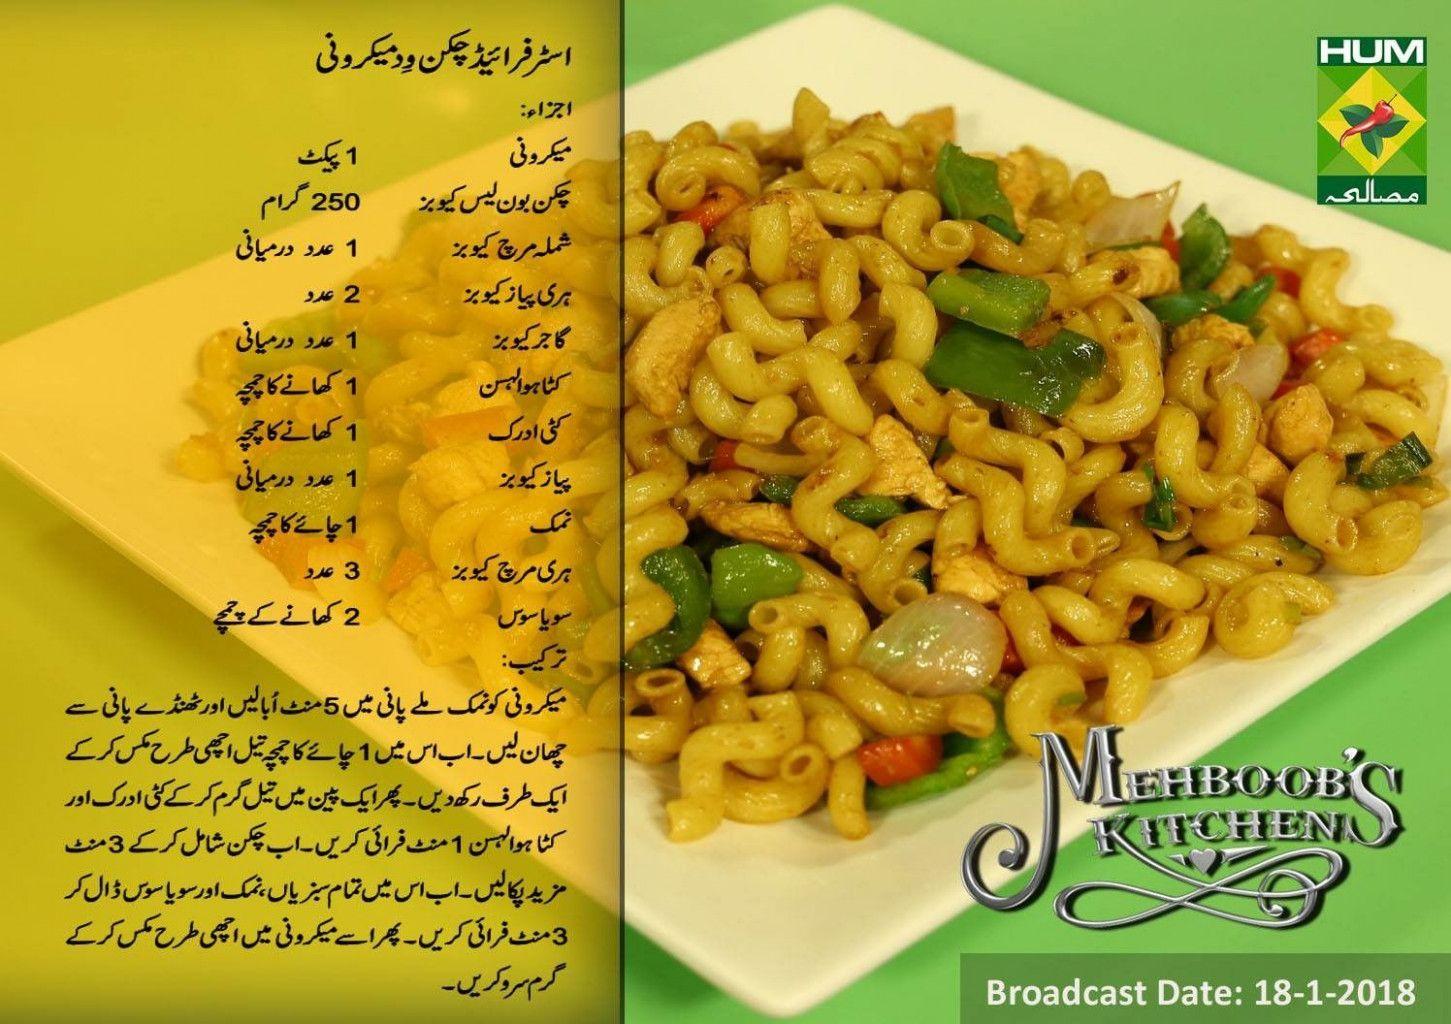 Pasta Recipes Easy In Urdu Cooking Recipes In Urdu Easy Cooking Recipes Easy Pasta Recipes